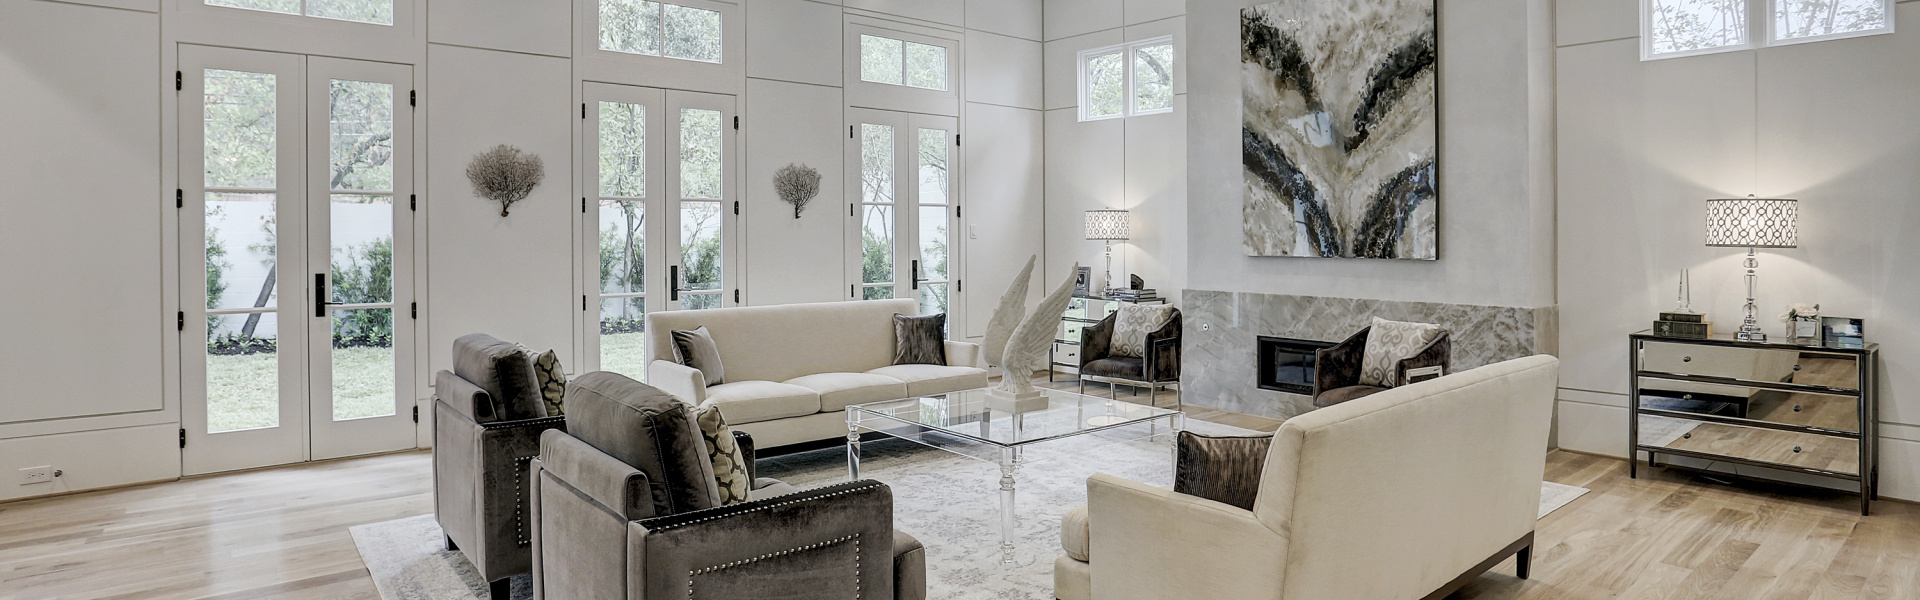 Smart home installation by StroTek for Galleria